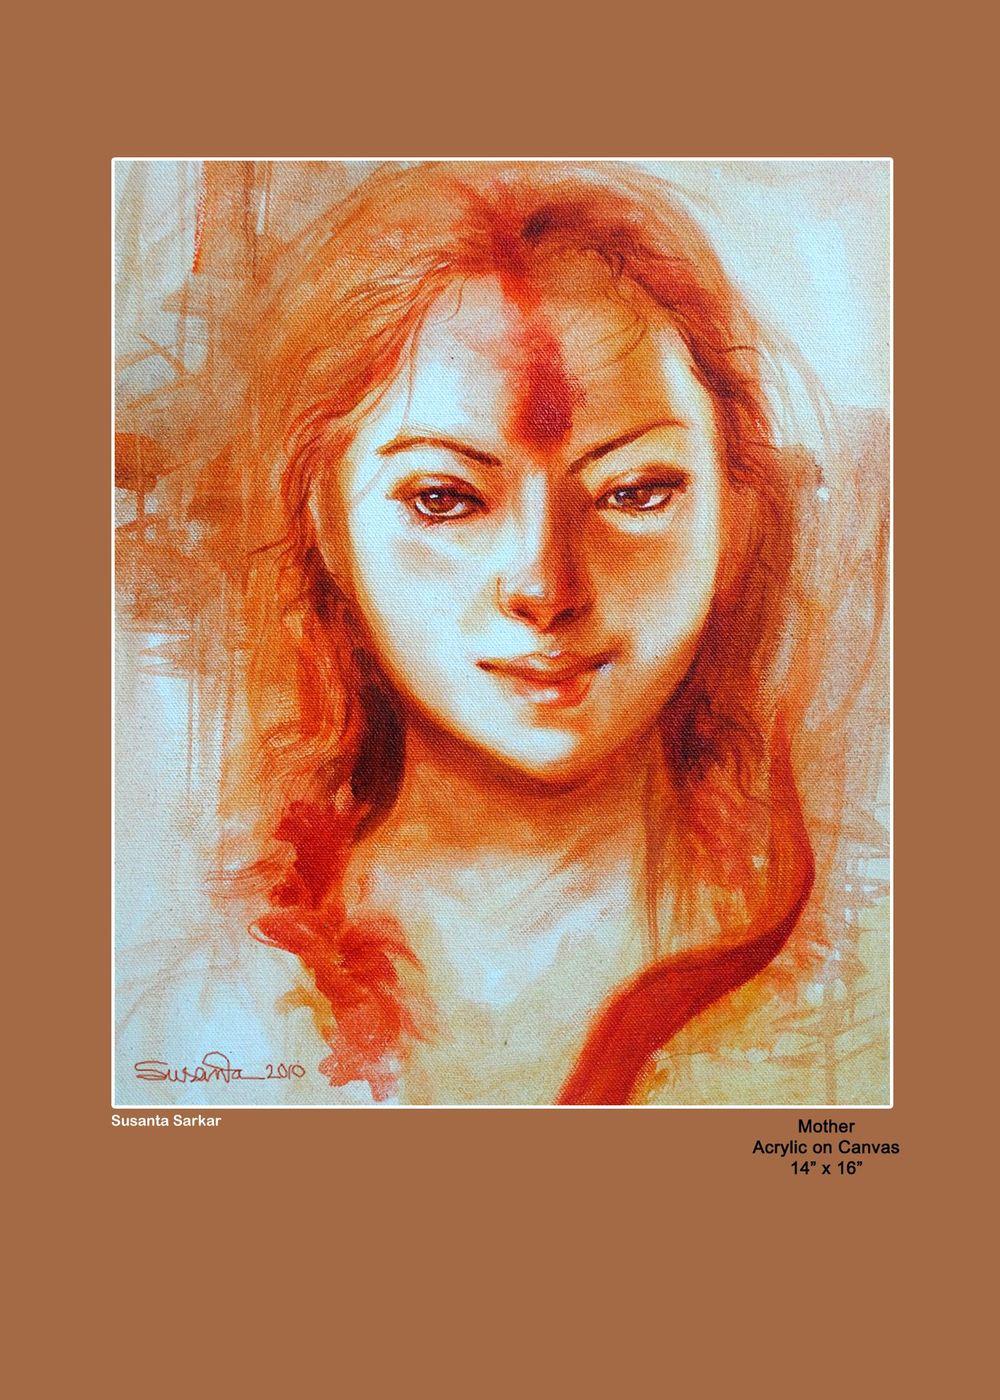 Susanta Sarkar